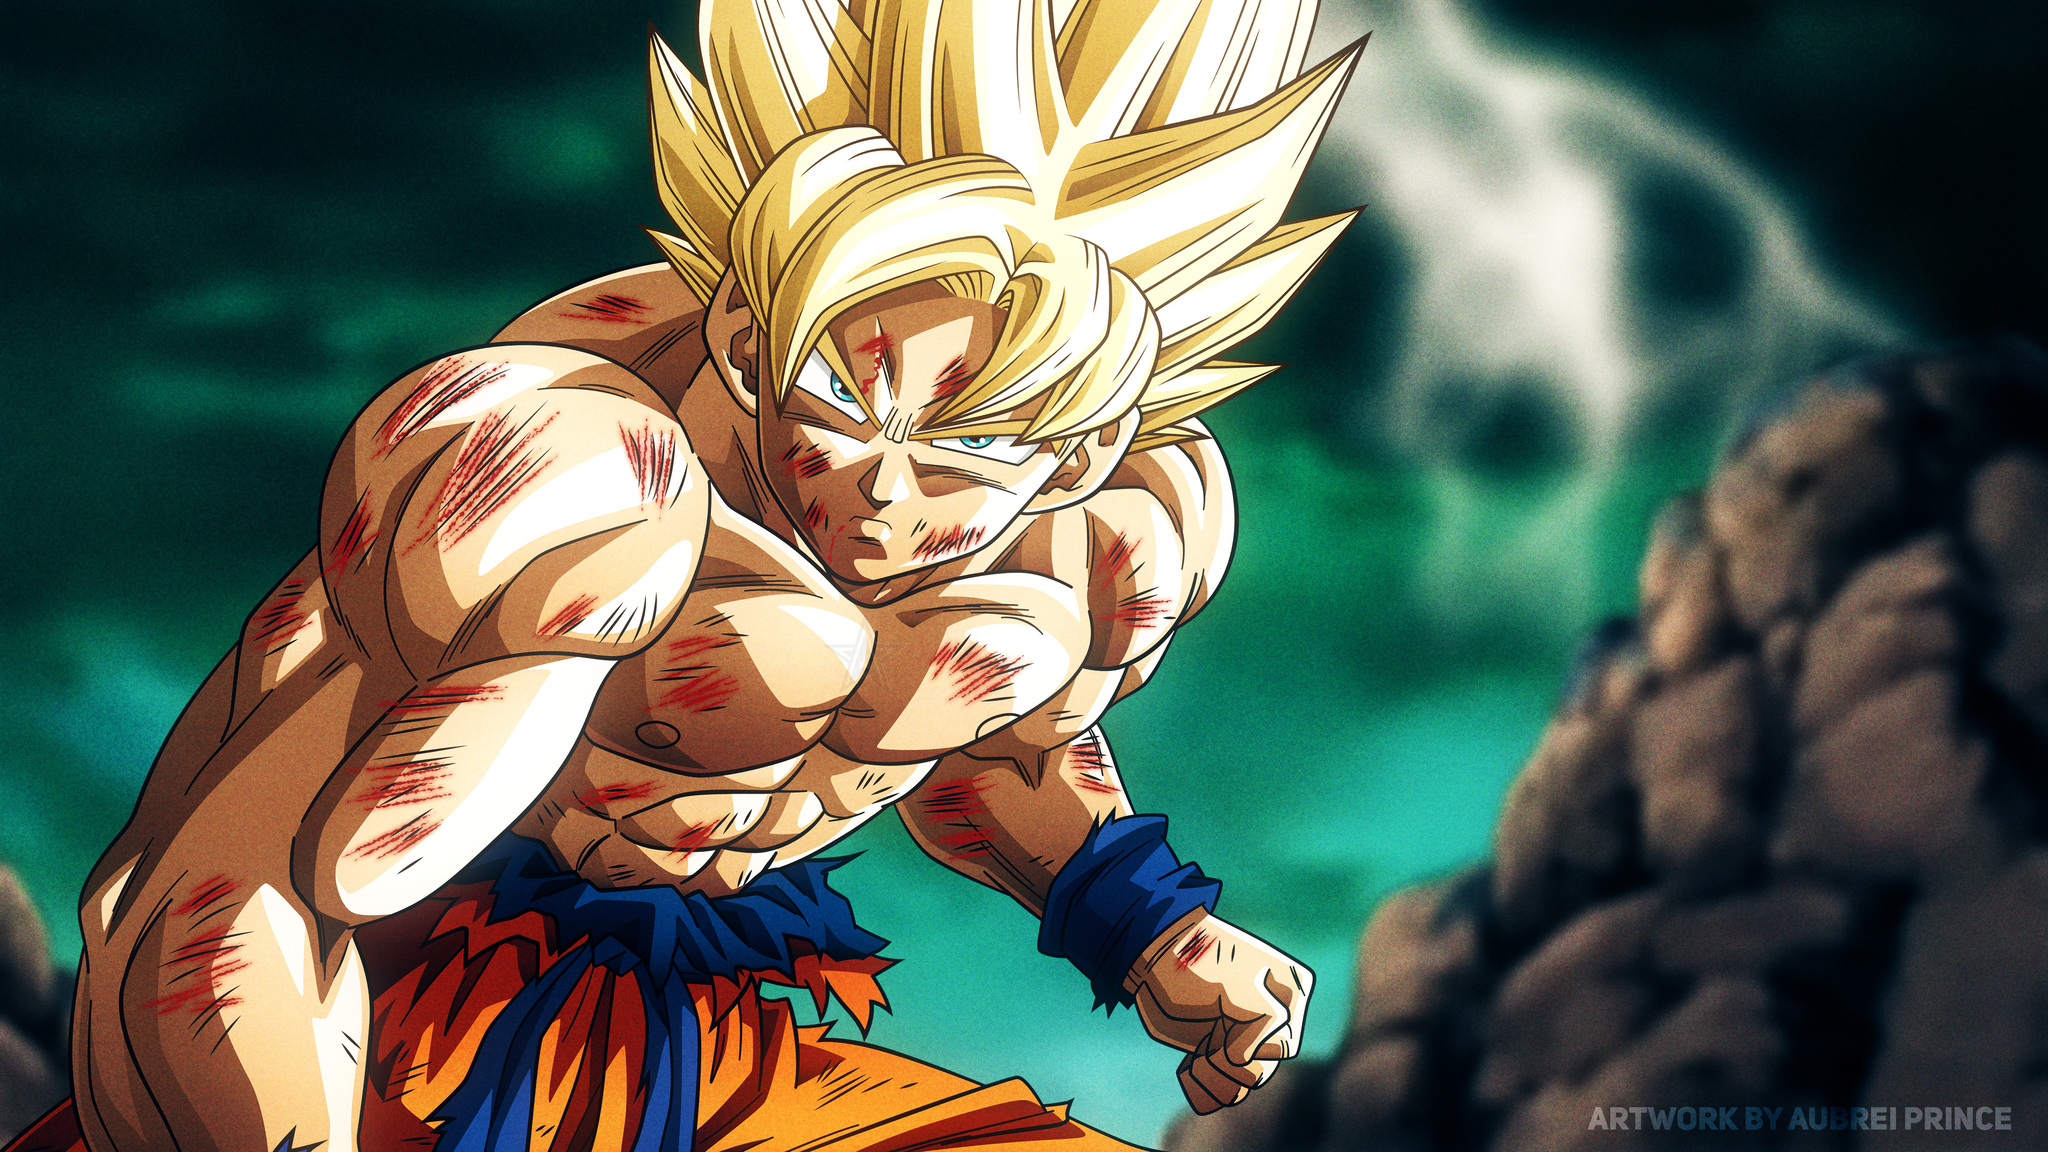 2048x1152 Super Saiyan Son Goku Dragon Ball Z 4k 2048x1152